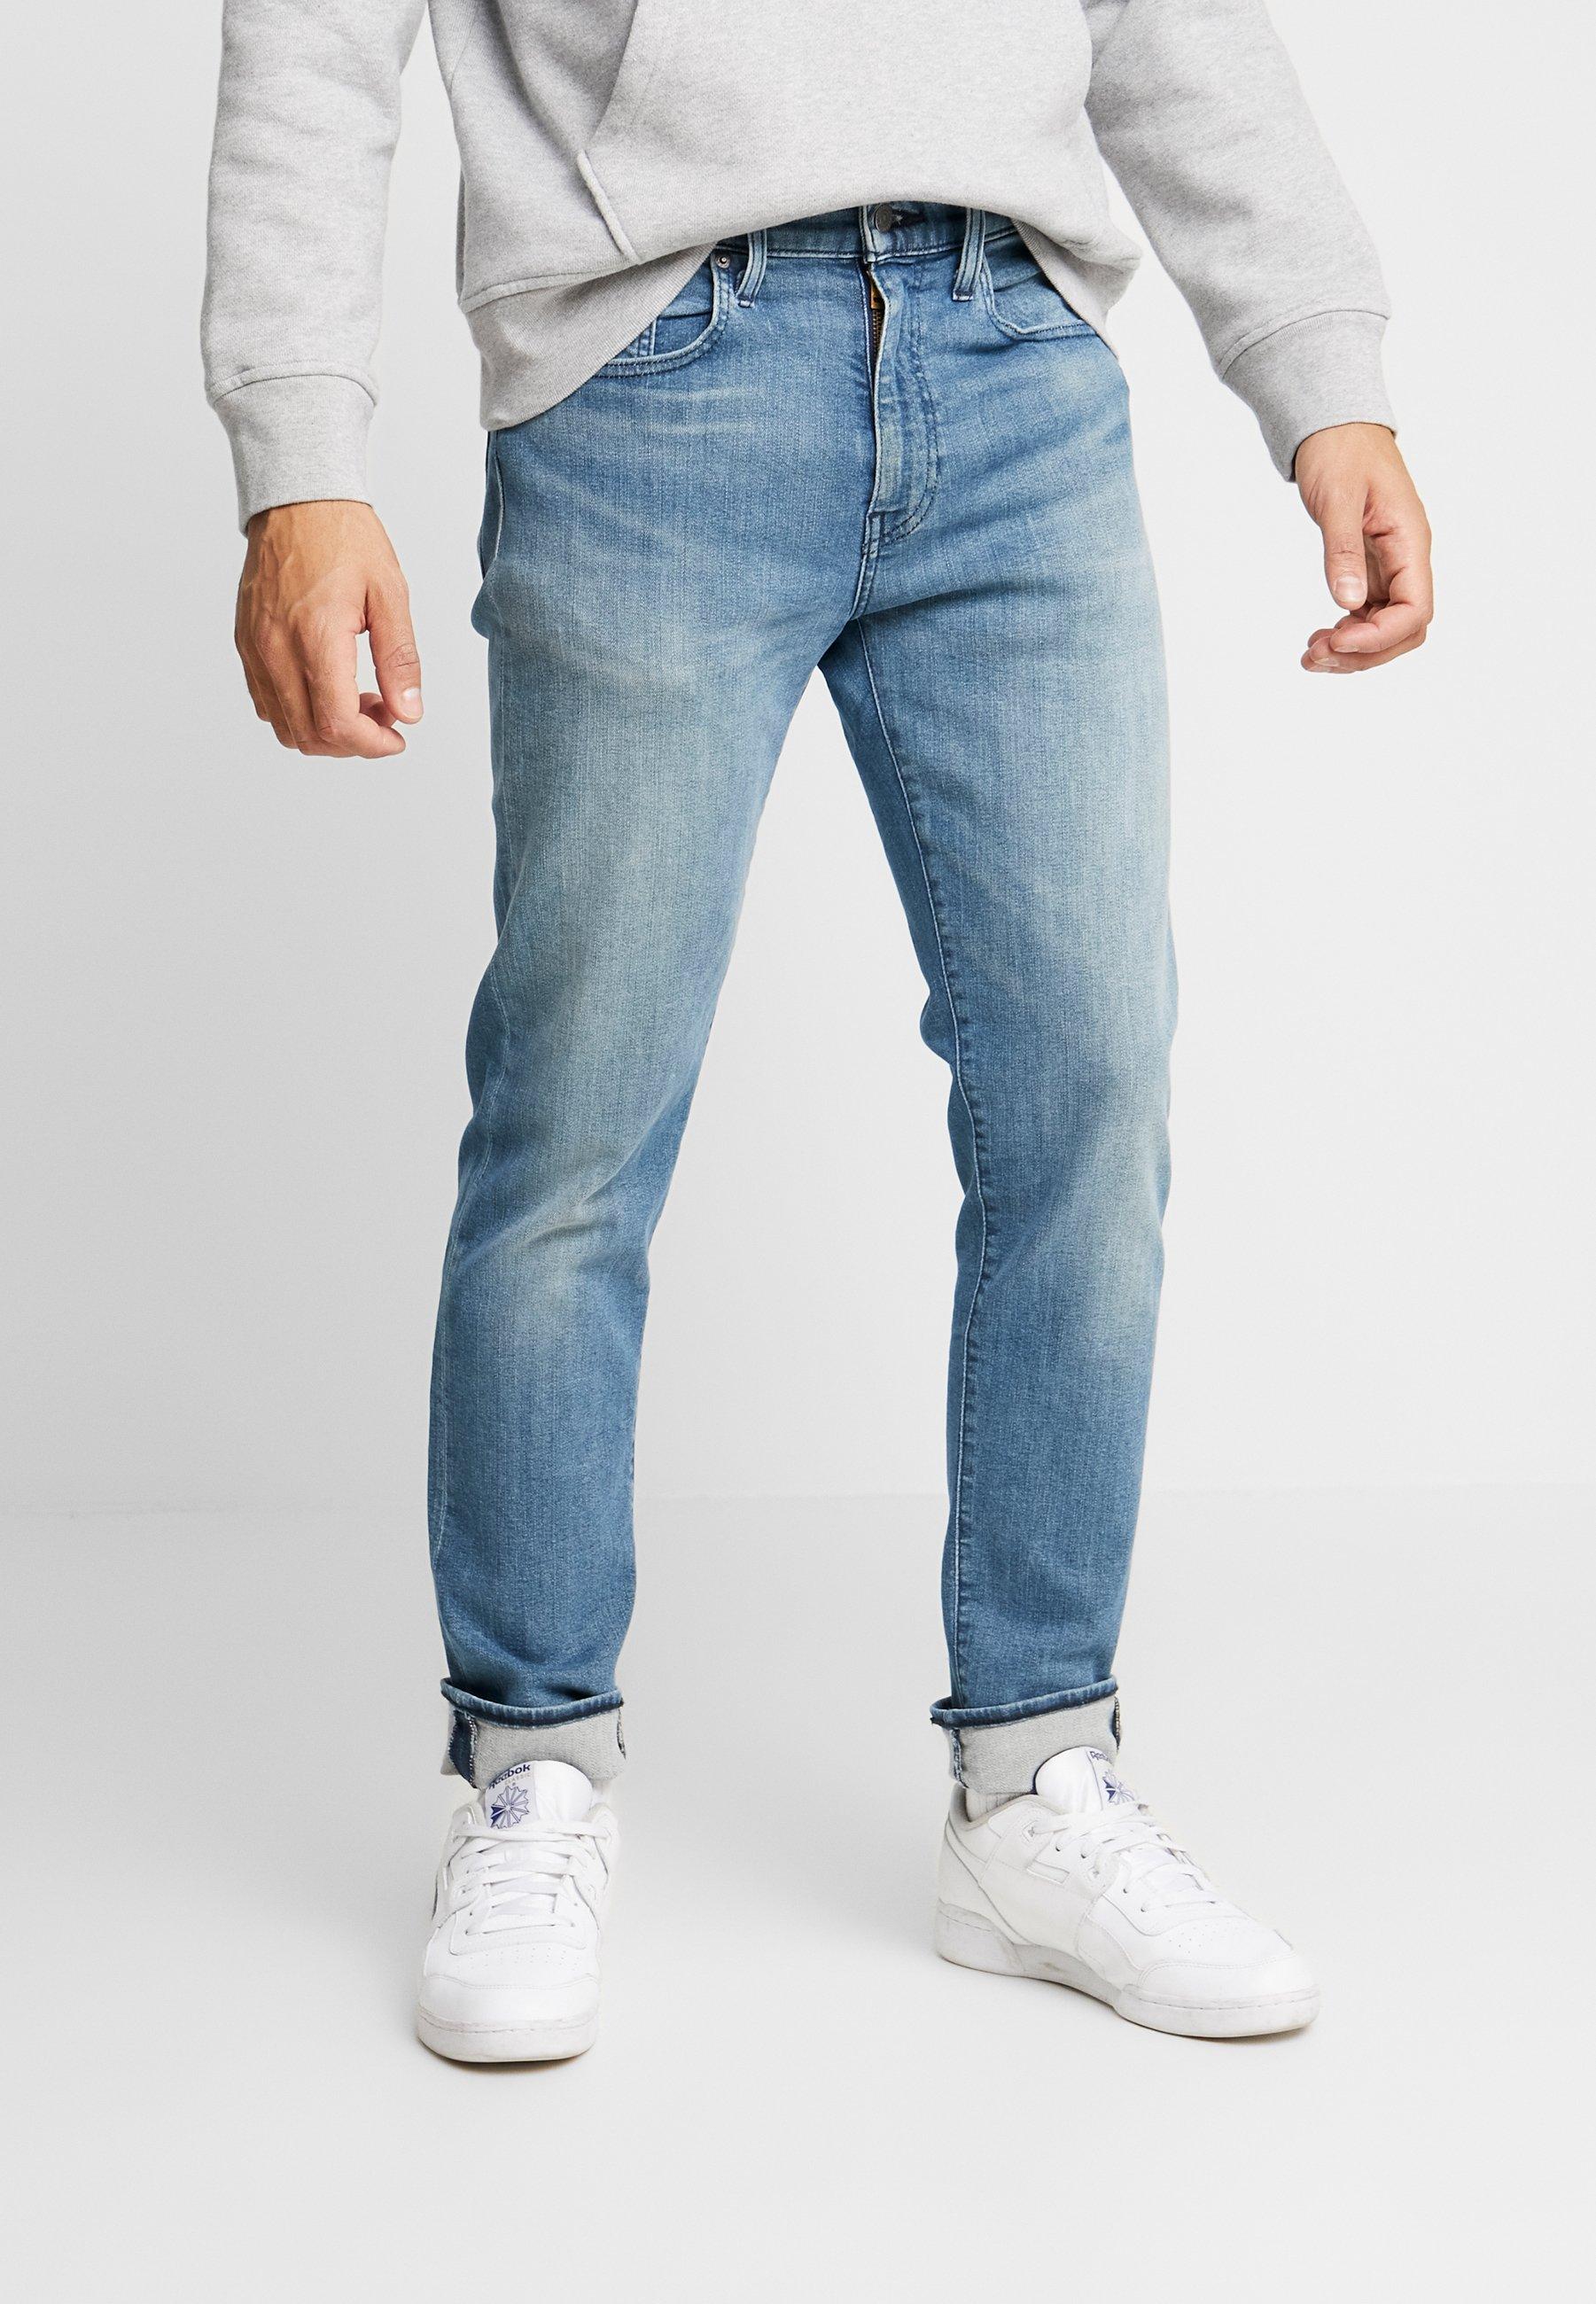 Klassinen Miesten vaatteet Sarja dfKJIUp97454sfGHYHD Levi's® 502™ TAPER Straight leg -farkut light-blue denim